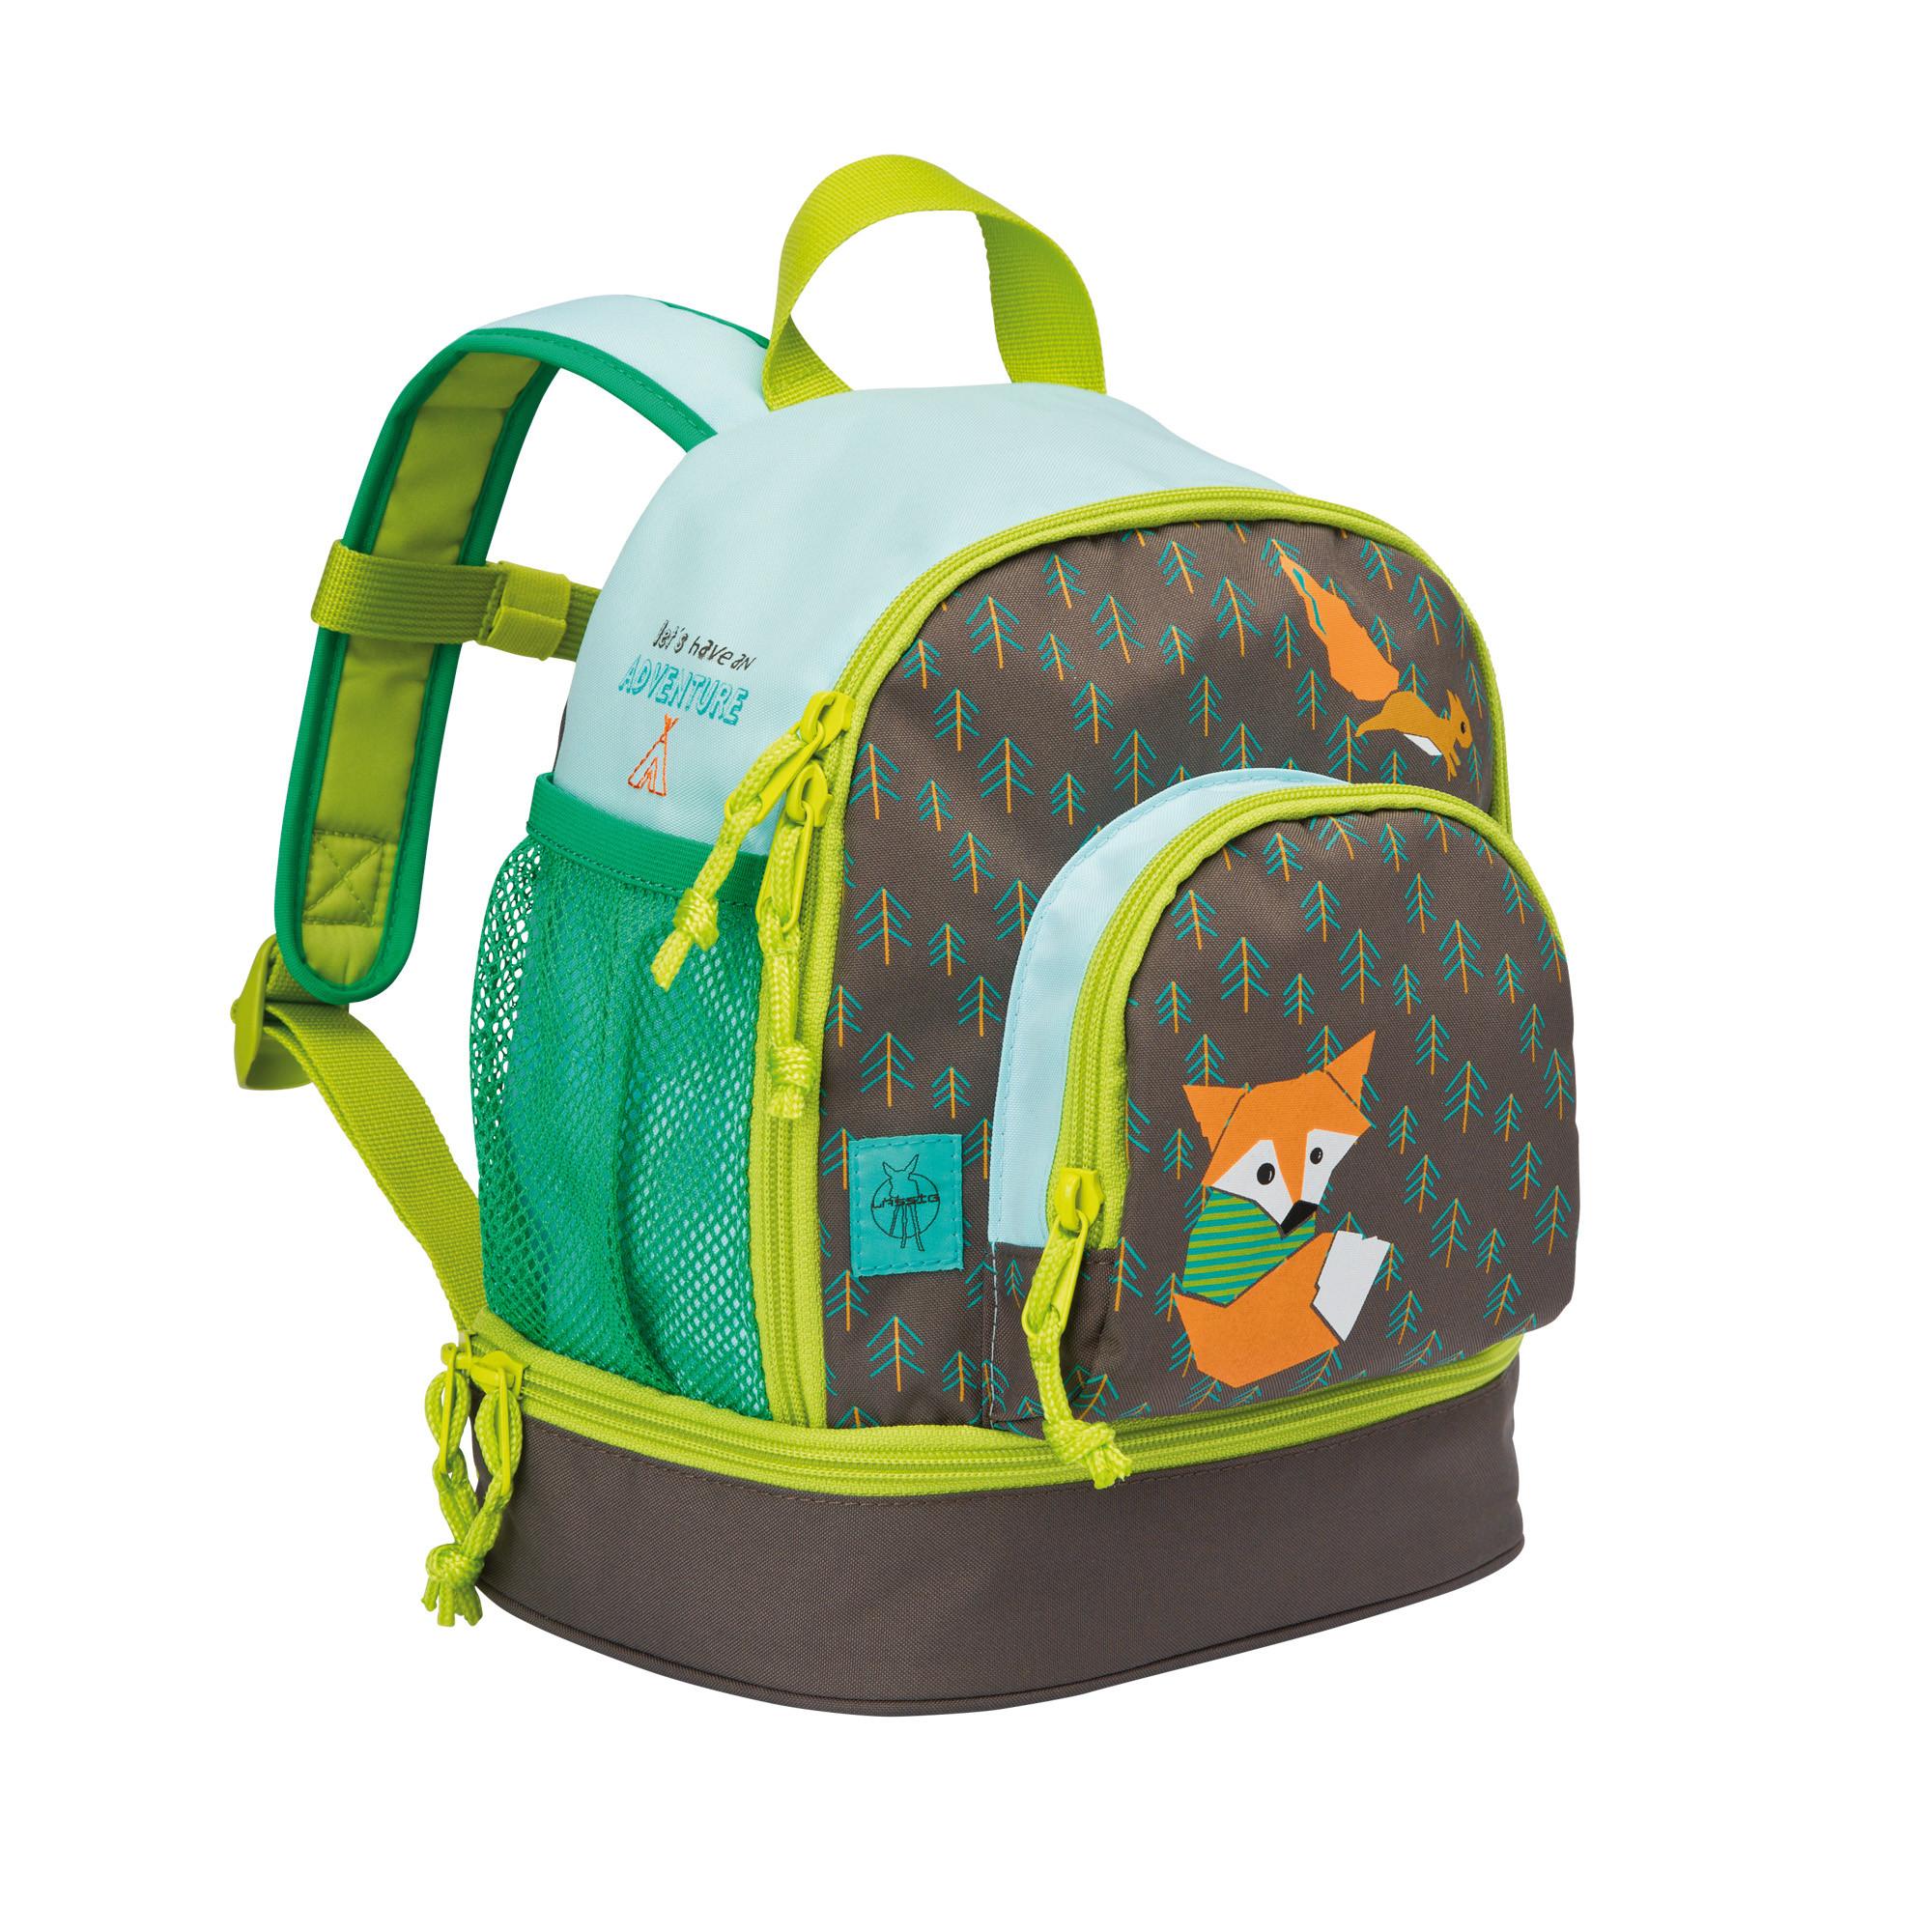 Mini Mochila Árbol Pequeño De Fox-042183336015-0